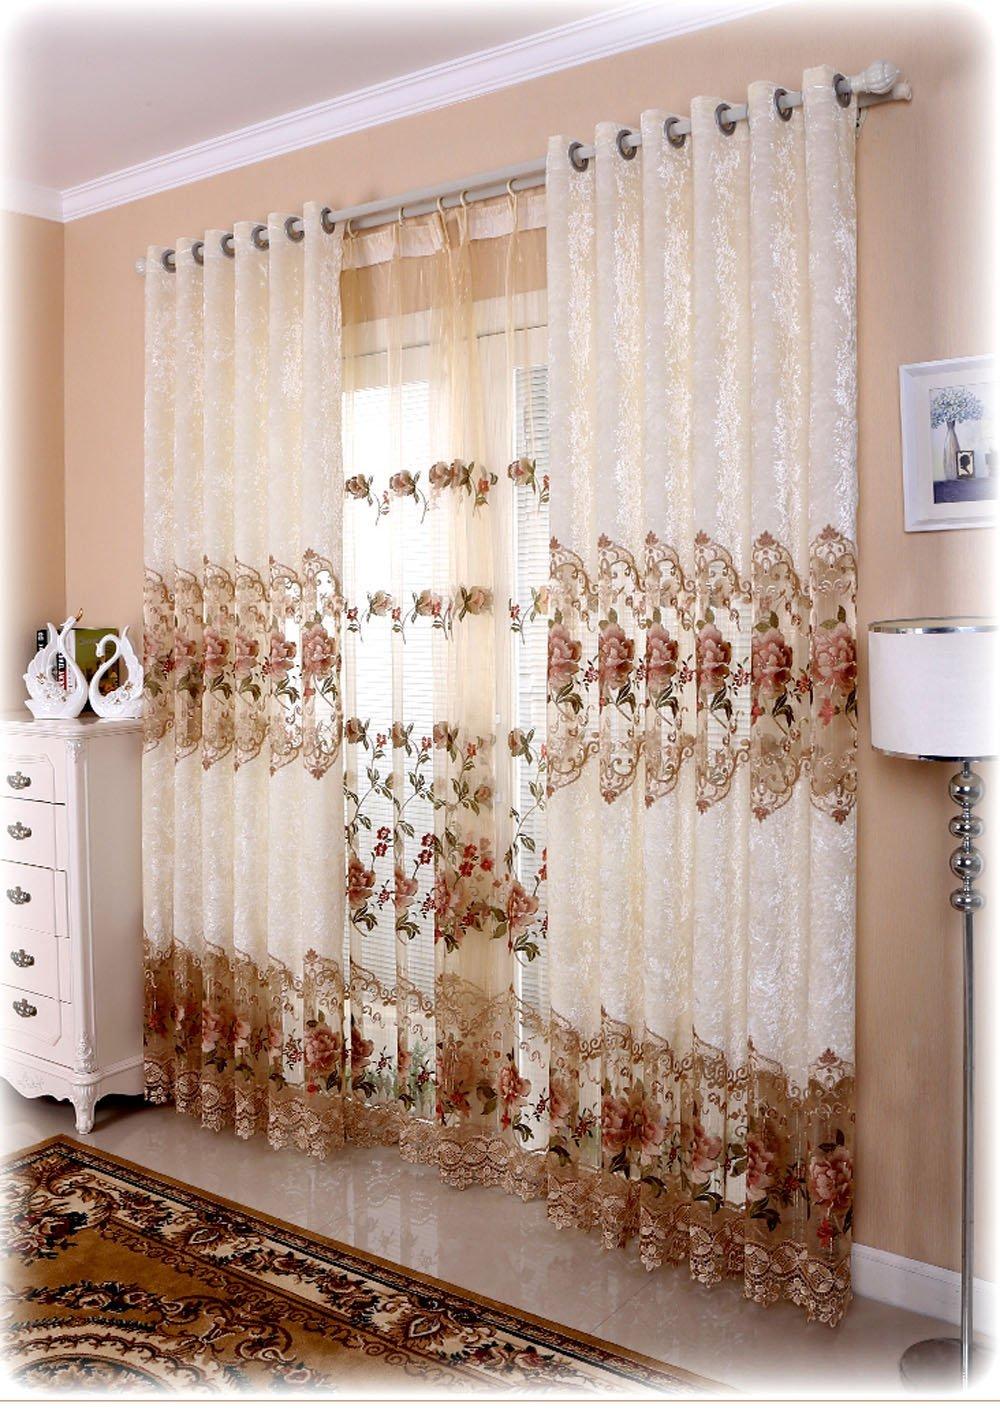 Amazoncom Shunshan Luxury Window Curtains For Living Room Set Of